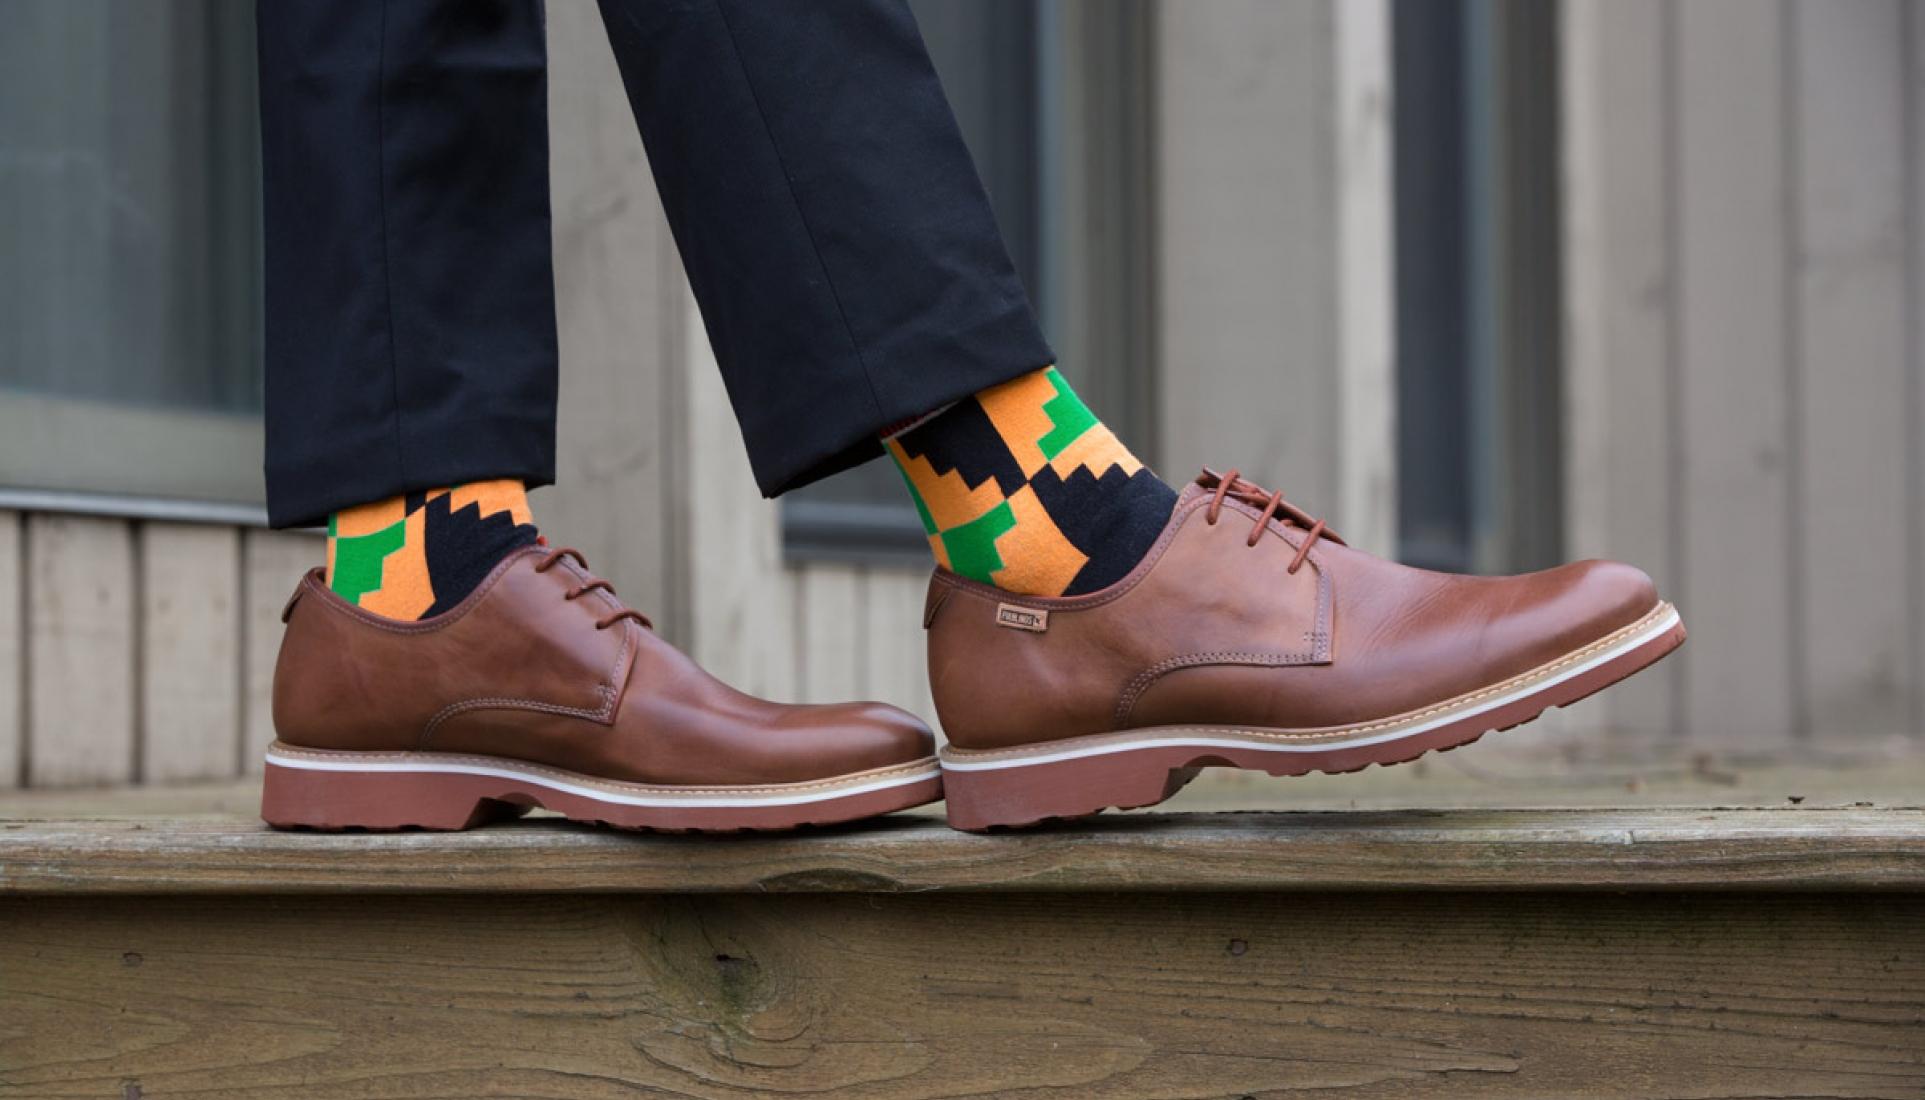 Mens-colorful-socks-54kingdoms-kente-lifestyle